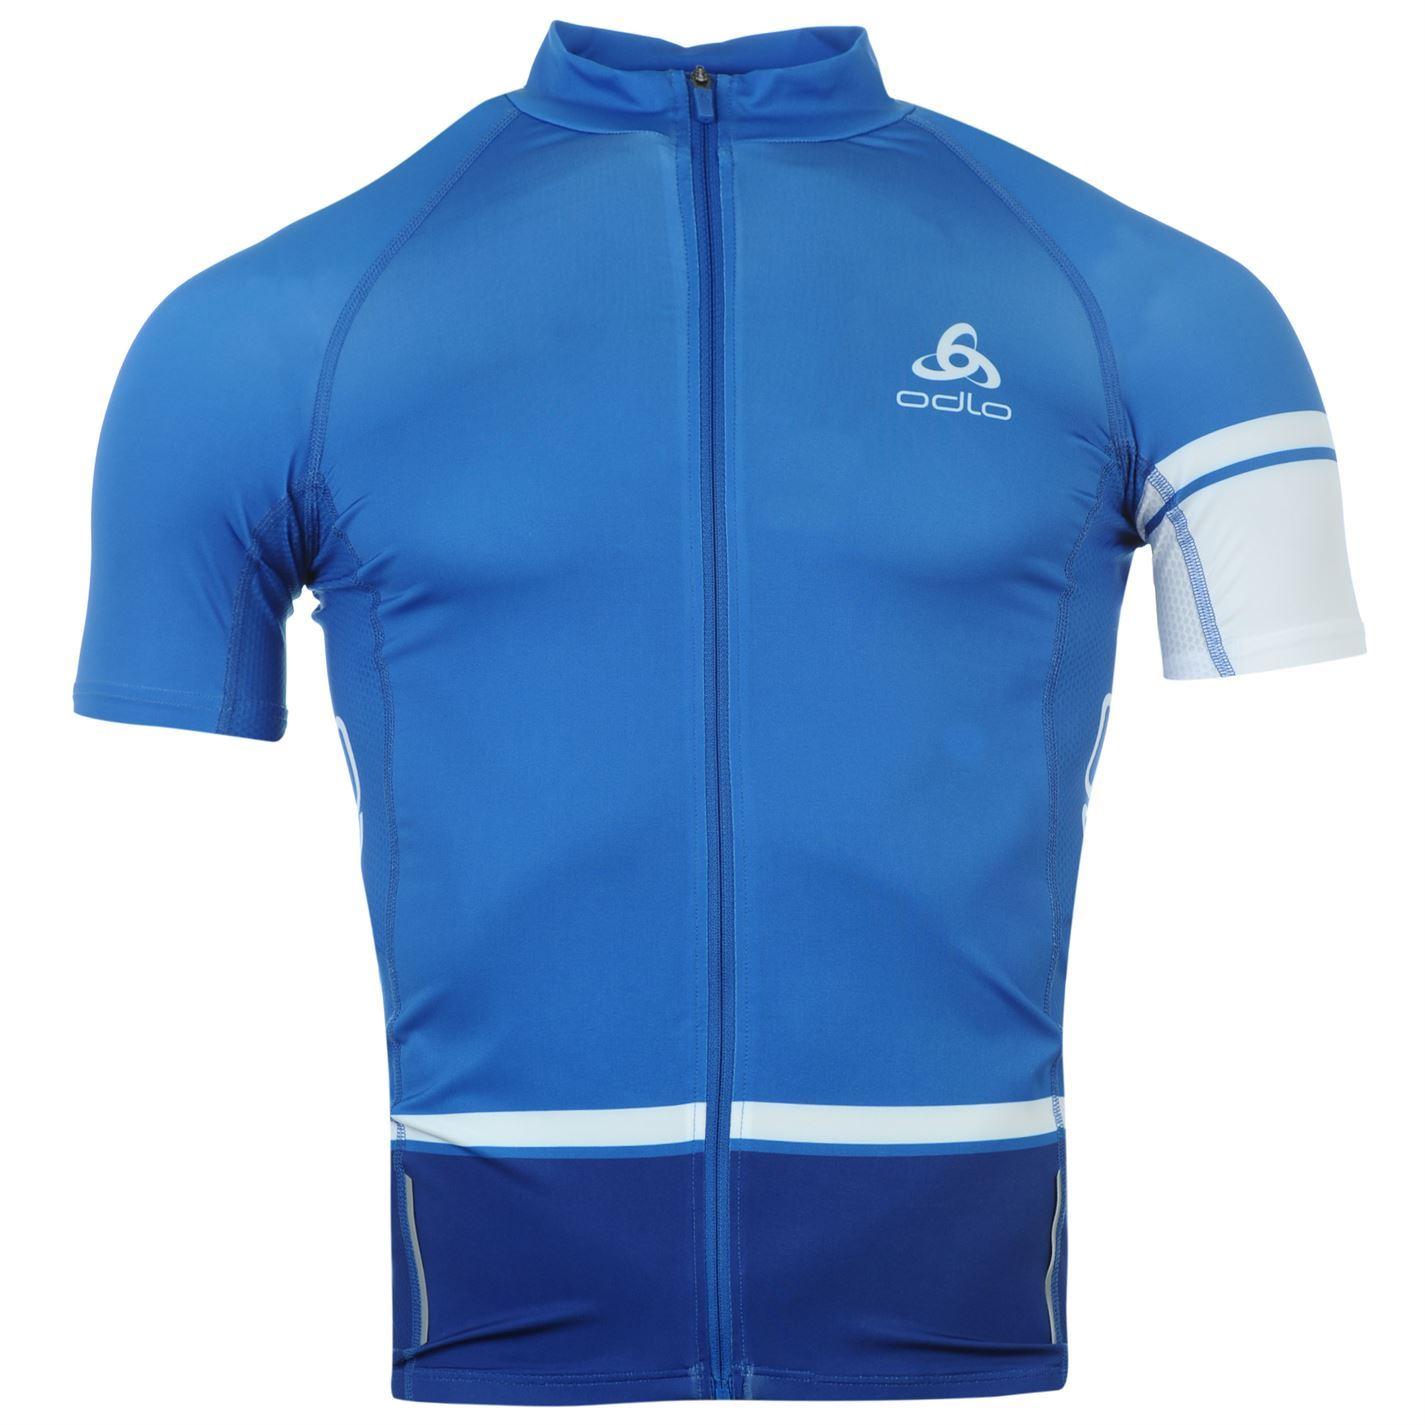 Odlo Mens Tourmalet Jersey Short Sleeve Zip Cycling T